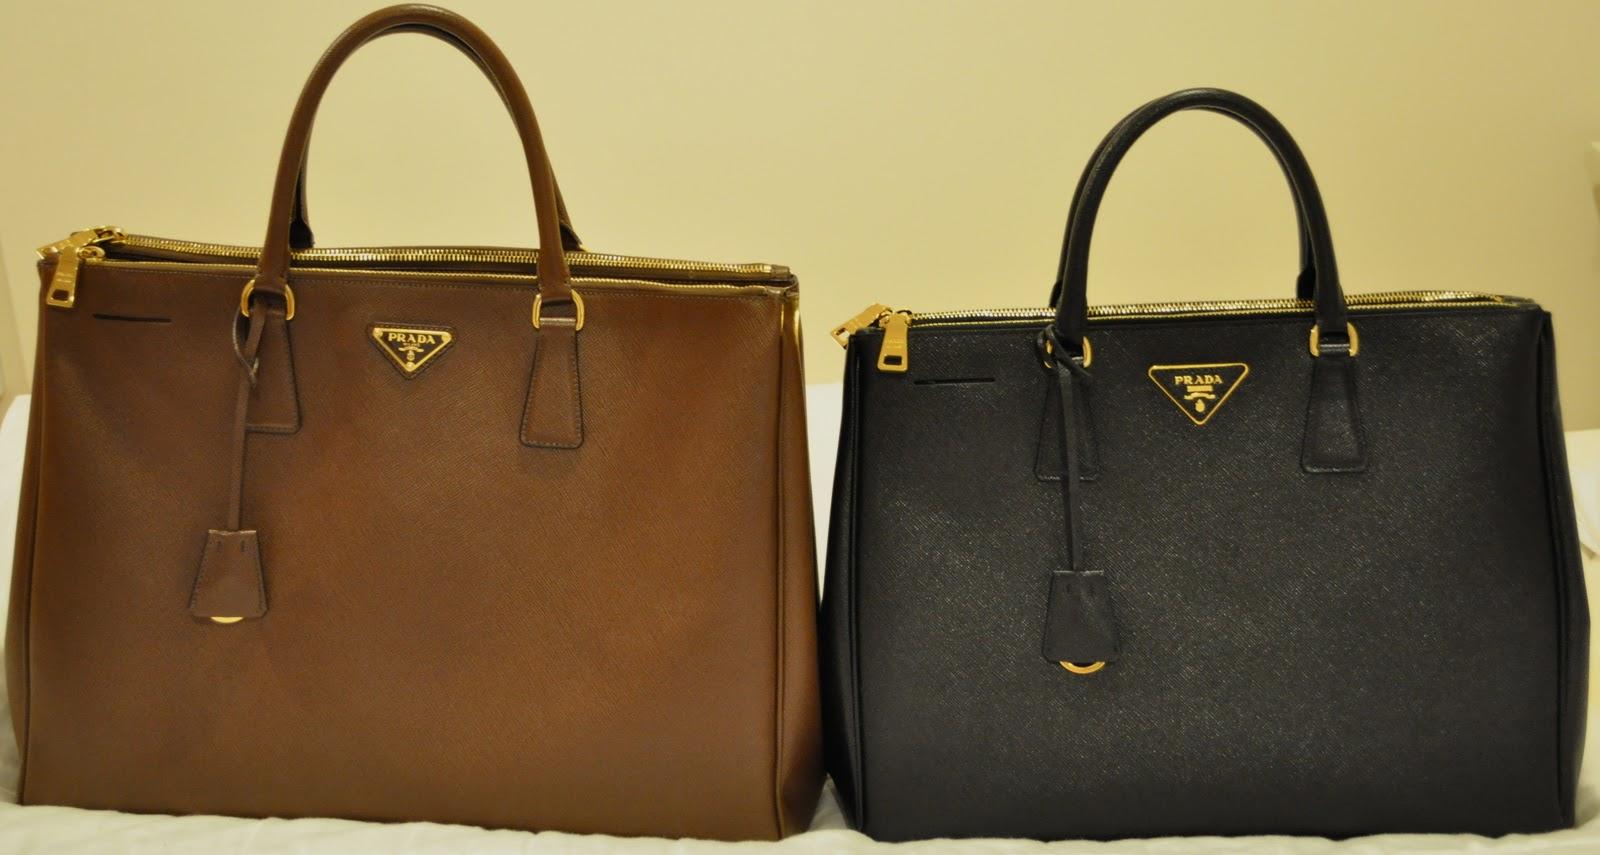 prada cross body handbags - dsc_0237.jpg